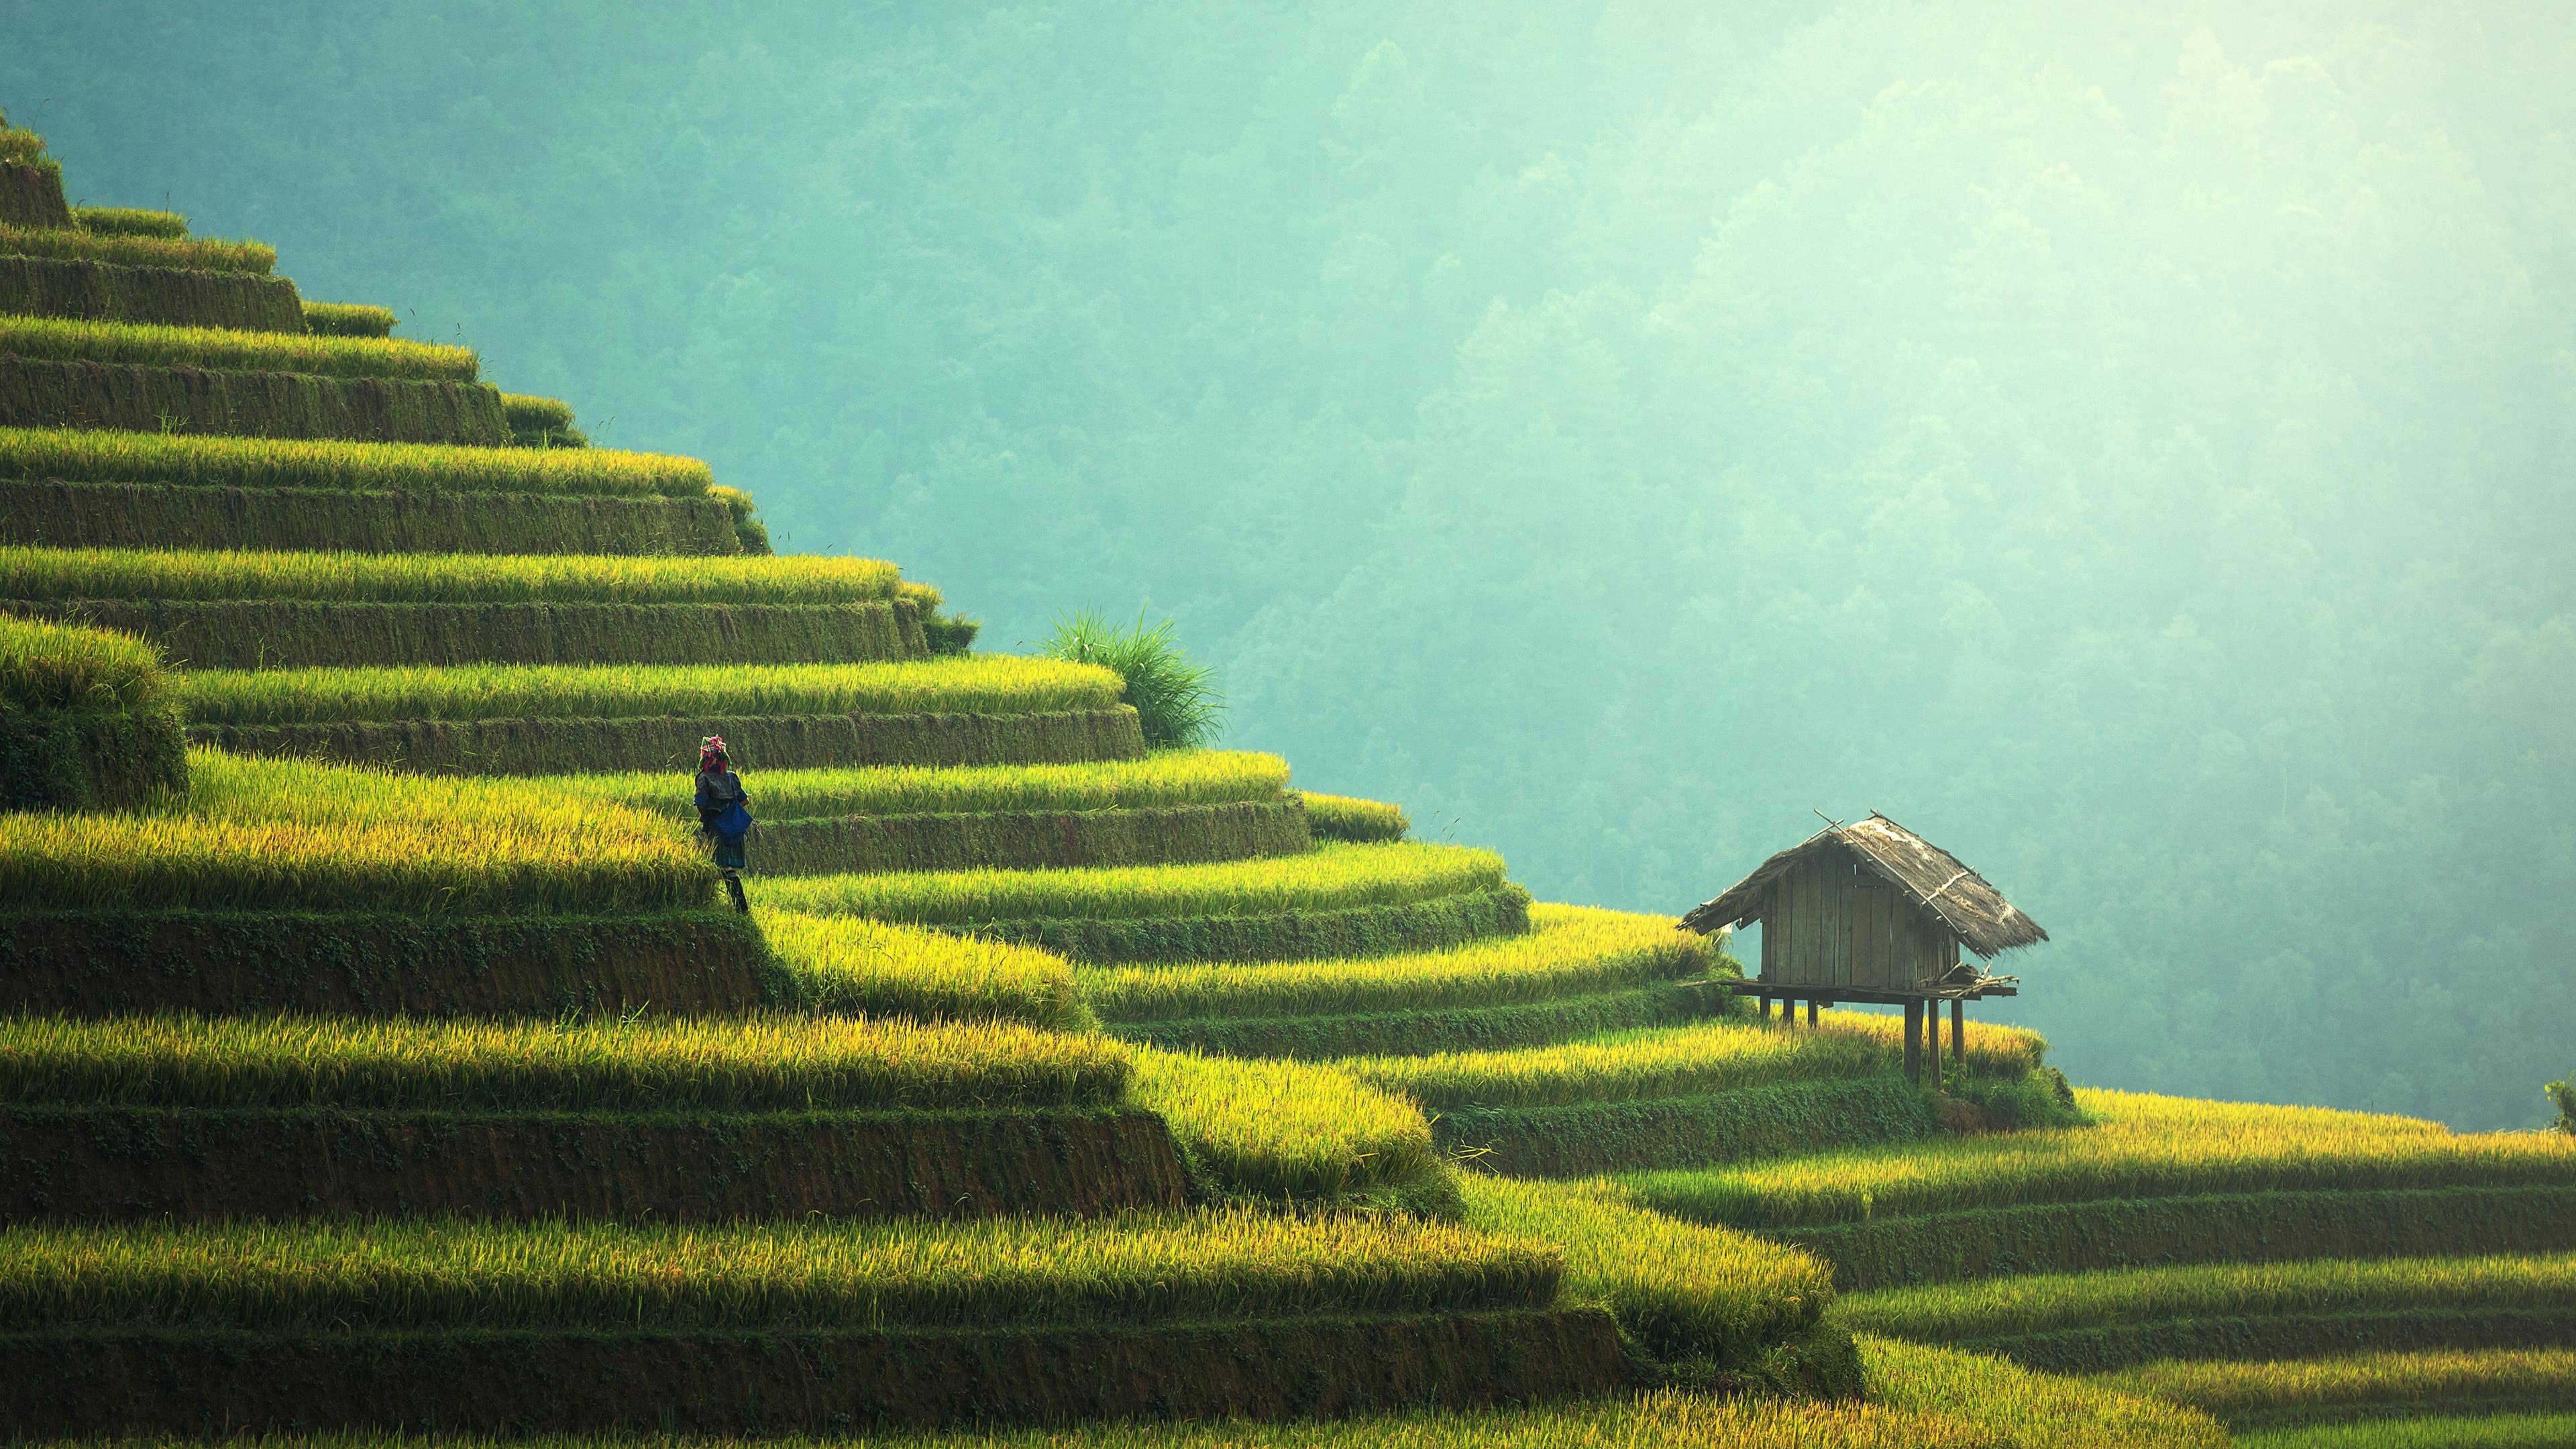 rice terraces china uhd 4k wallpaper